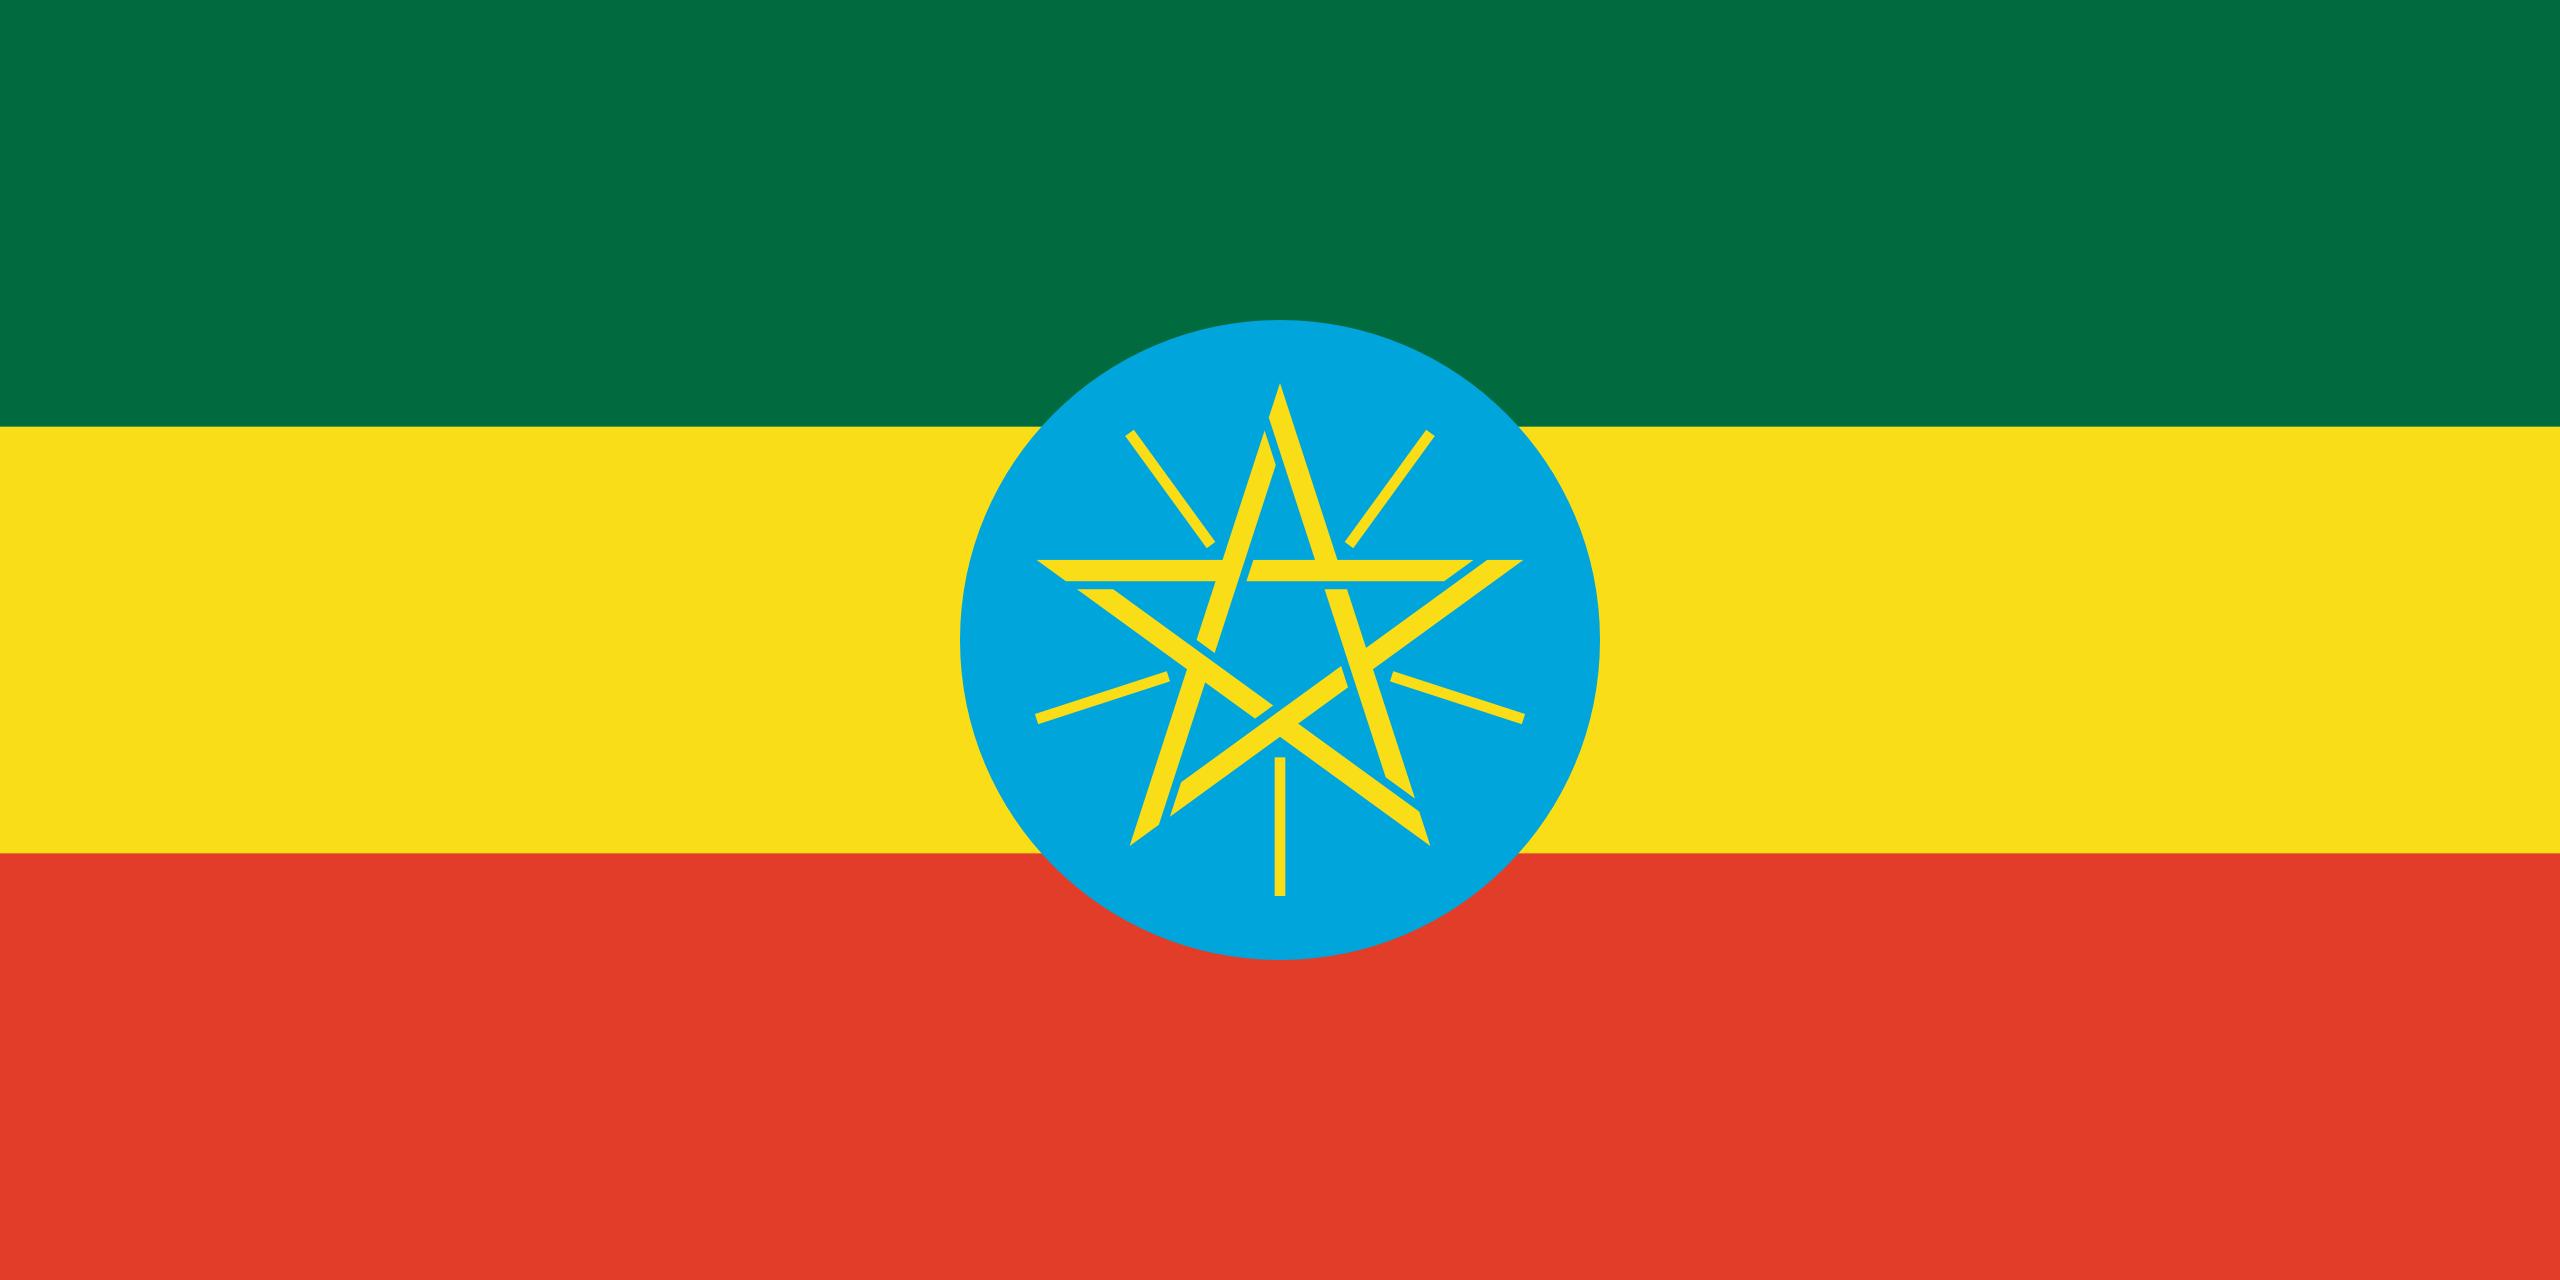 etiopía, देश, emblema, लोग�प्रतीकbolo - HD वॉलपेपर - प्रोफेसर-falken.com